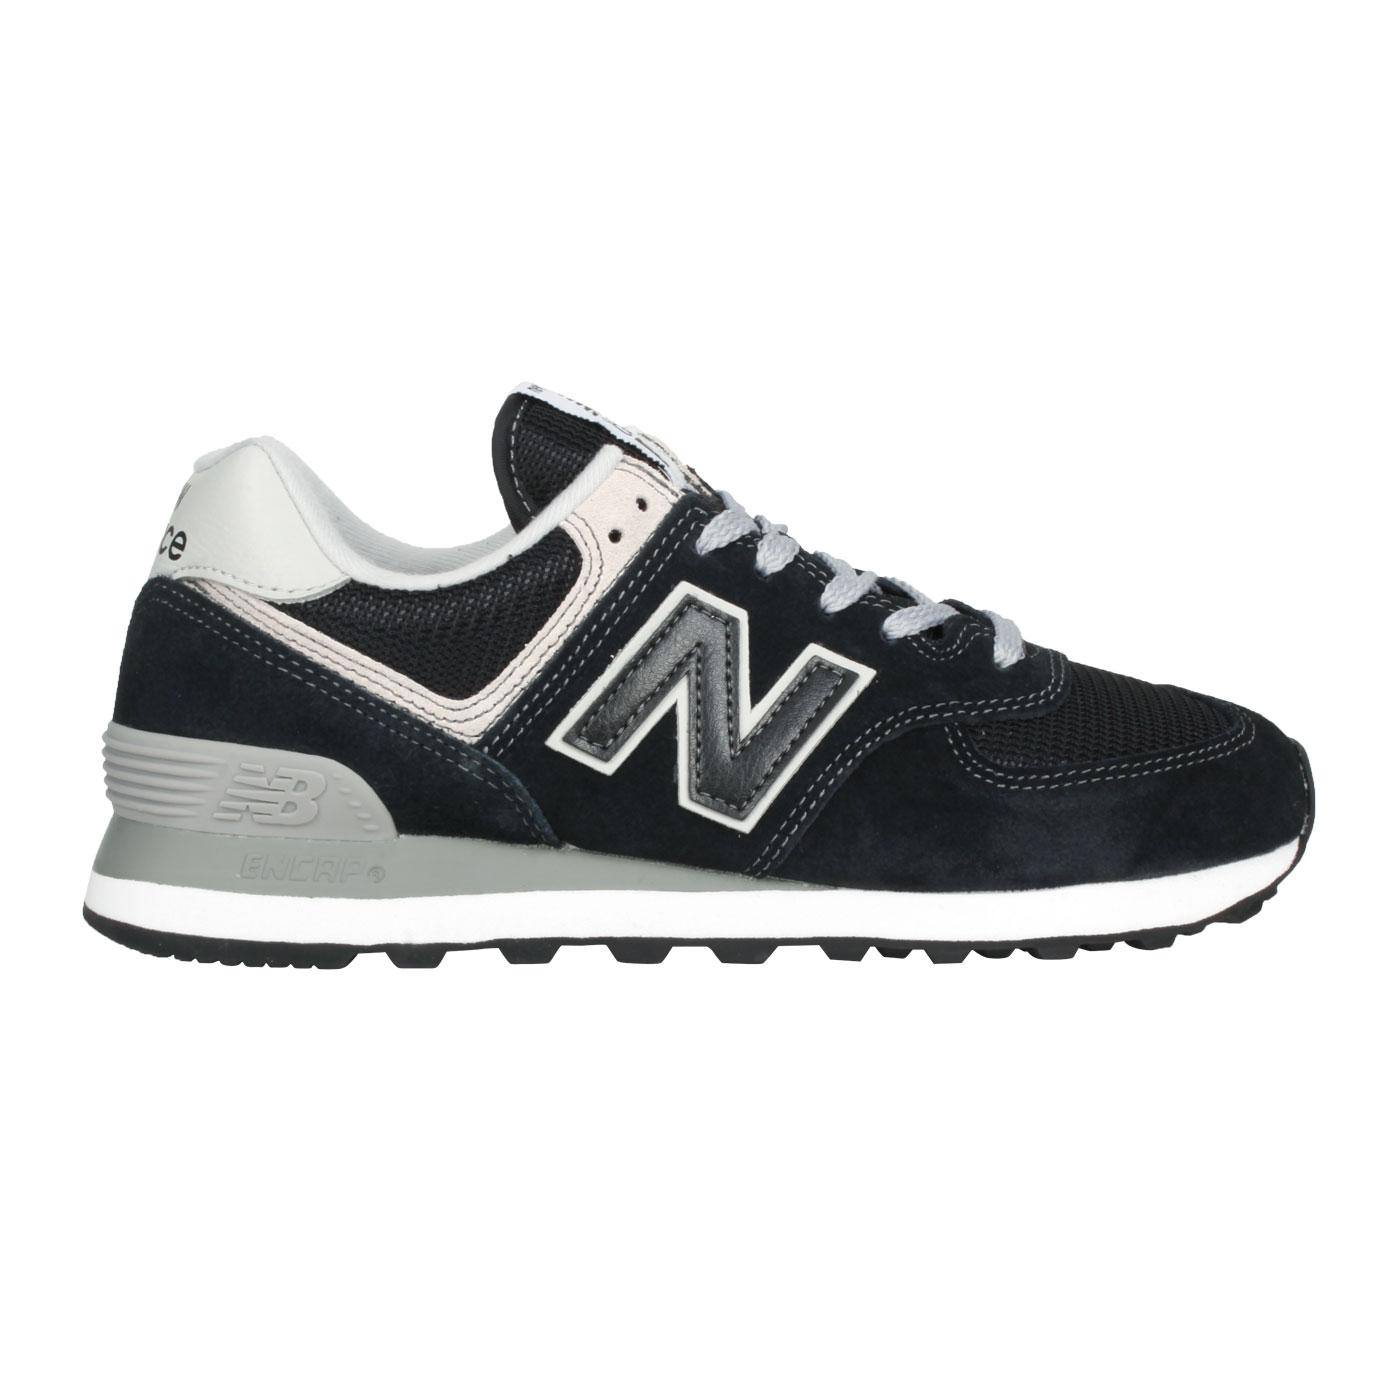 NEW BALANCE 女款休閒運動鞋 WL574EB - 黑灰